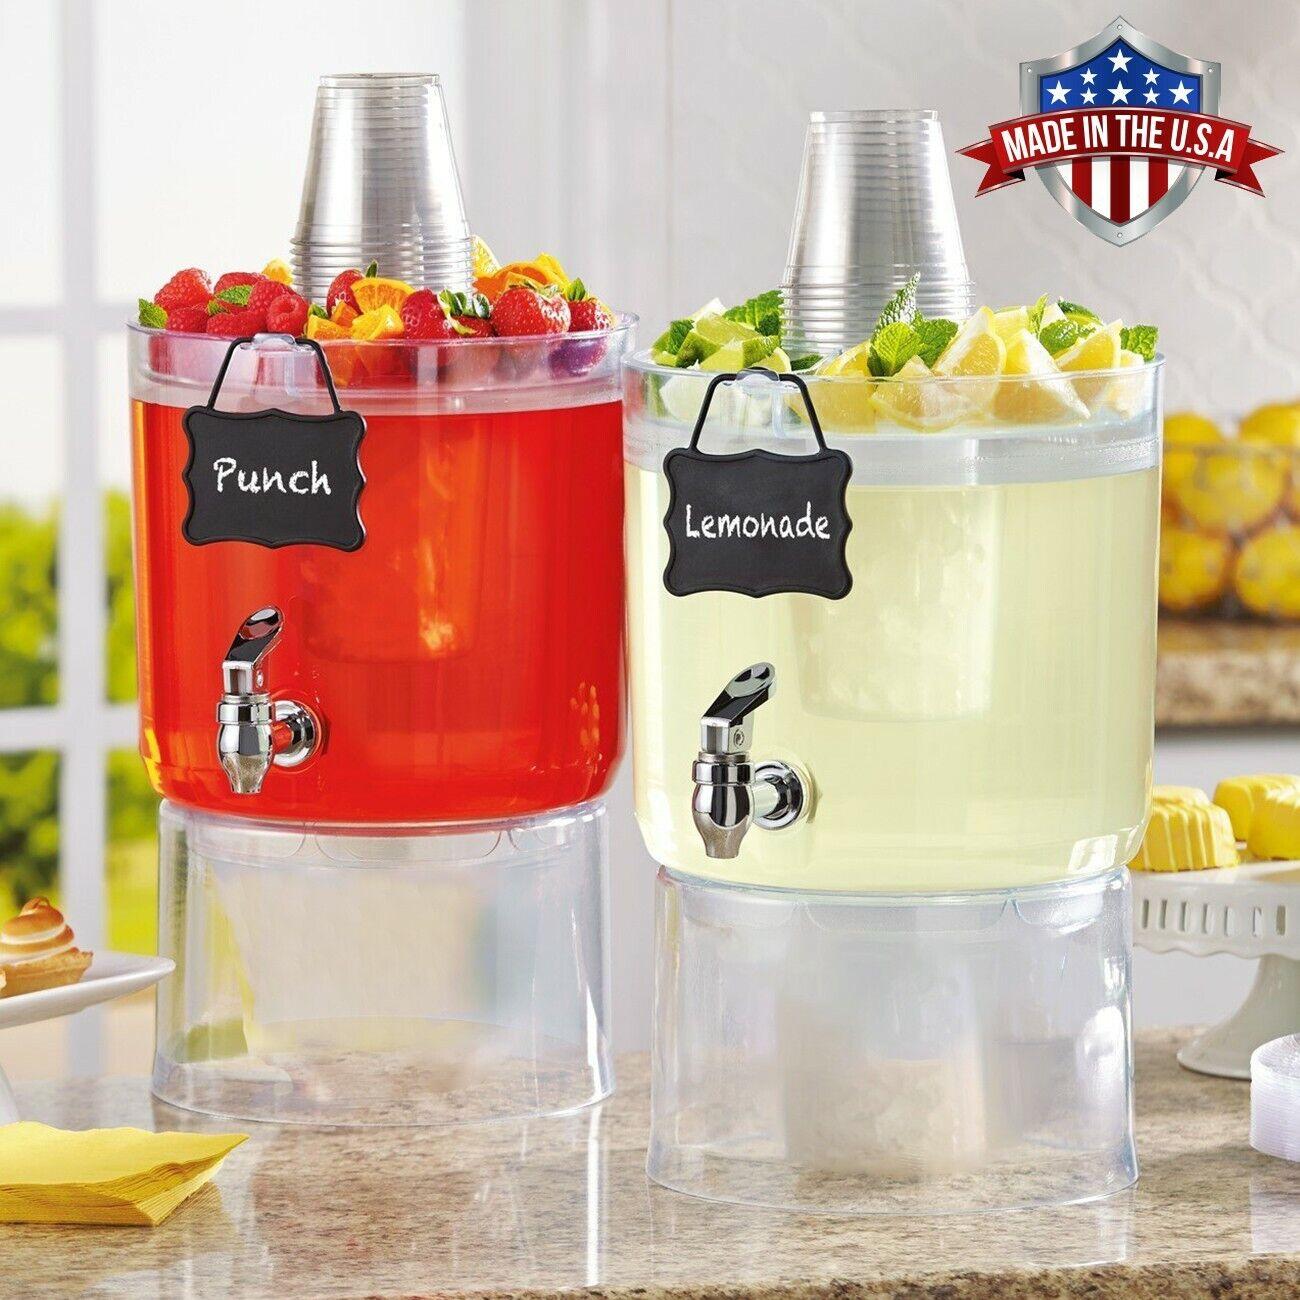 2 Pack Cold Beverage Drink Dispenser Stackable 1.75 Gallon with Chalkboard Label Dinnerware & Serveware